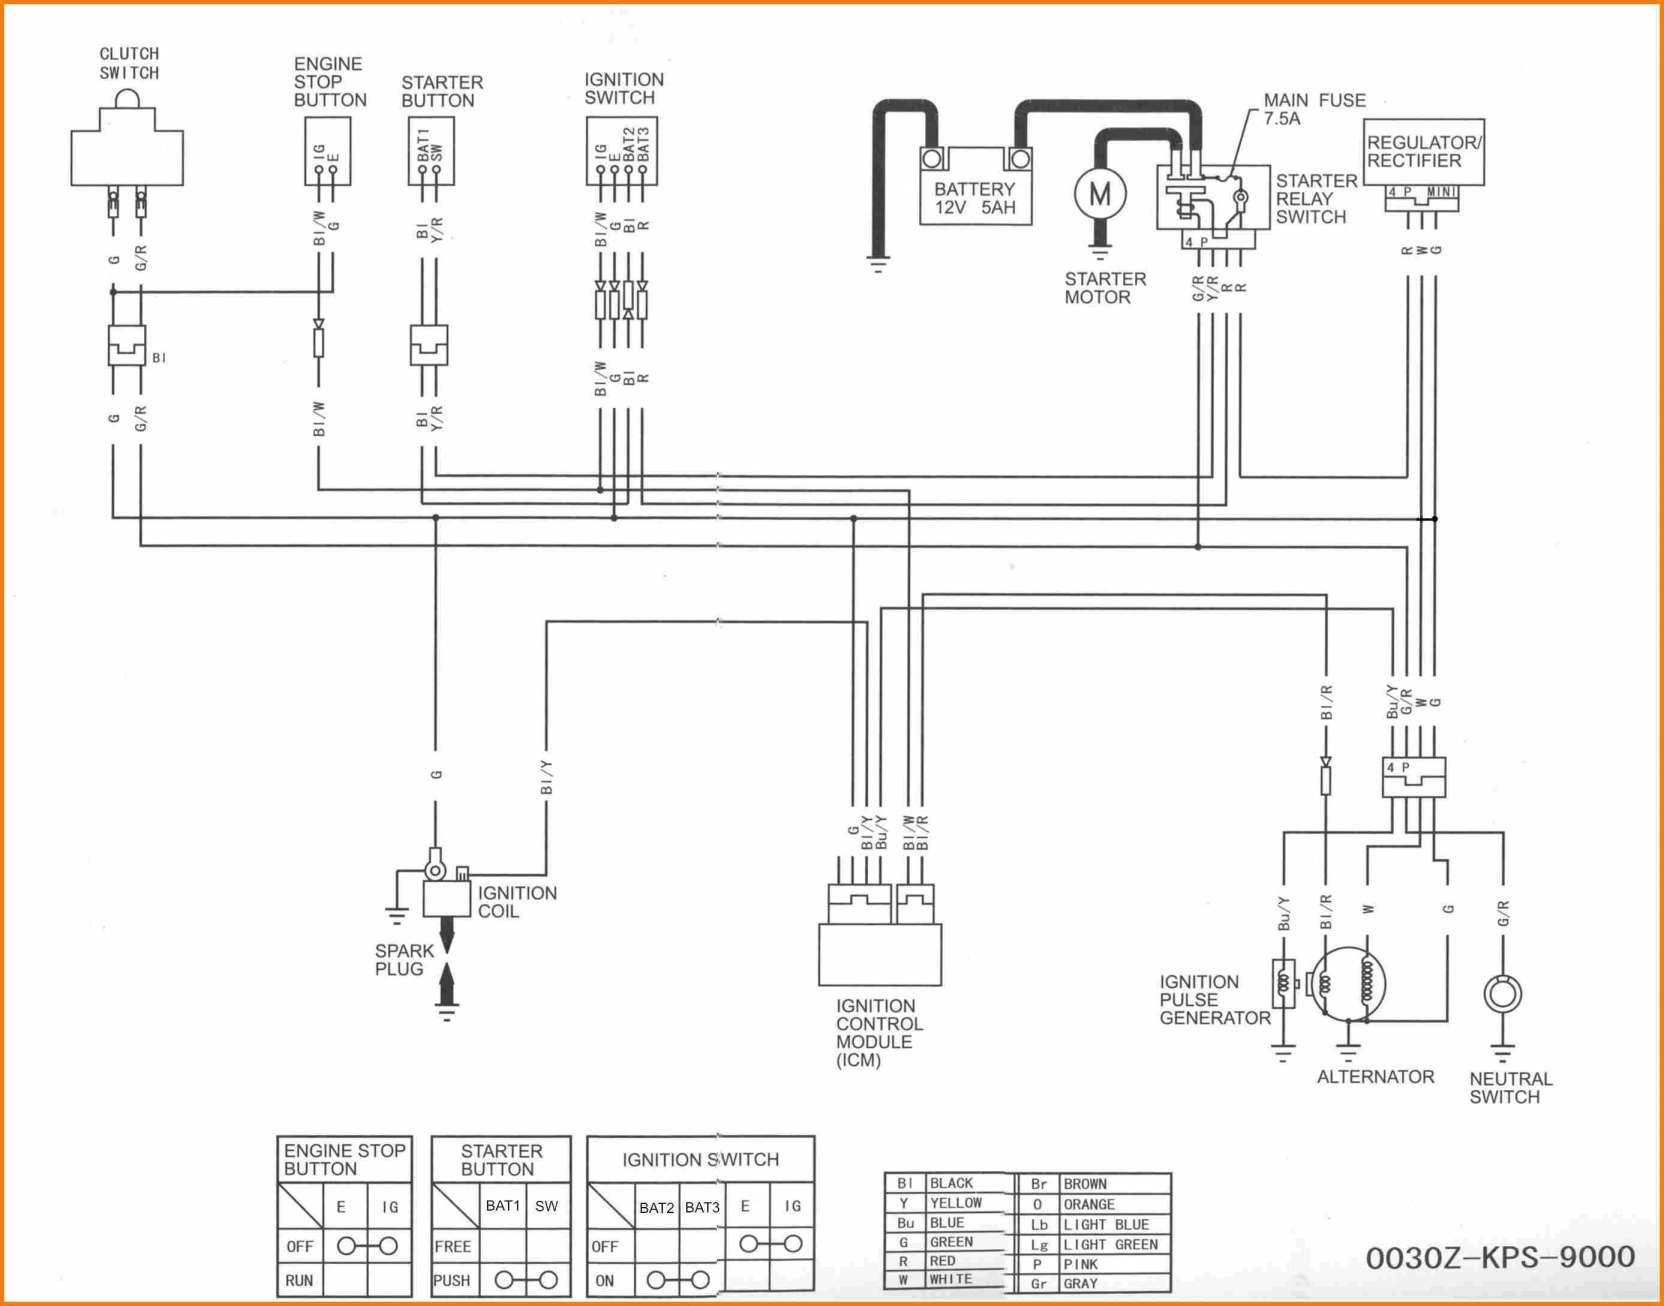 Pit Bike Engine Wiring Diagram And Dirt Bike Wiring Diagram Wiring Diagram Signals Its 16 Pit Bike Engine Wiring Diagram In 2020 Motorcycle Wiring Pit Bike Electrical Wiring Diagram